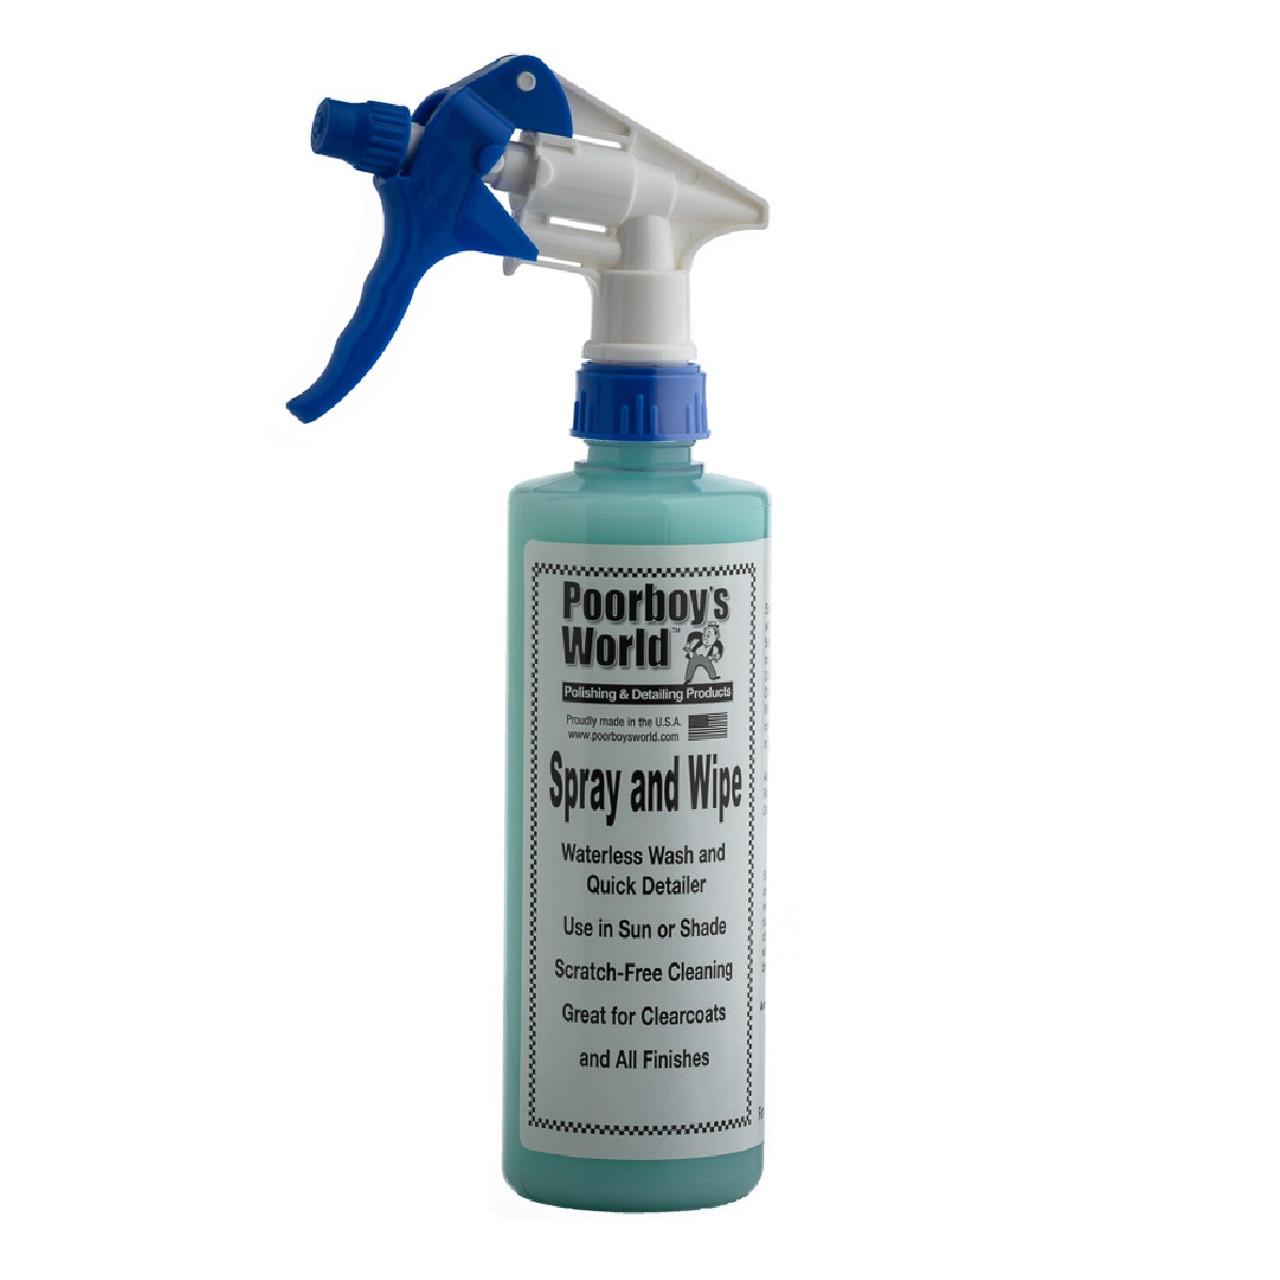 Poorboy's World Spray and Wipe Waterless Wash 16oz w/ Sprayer